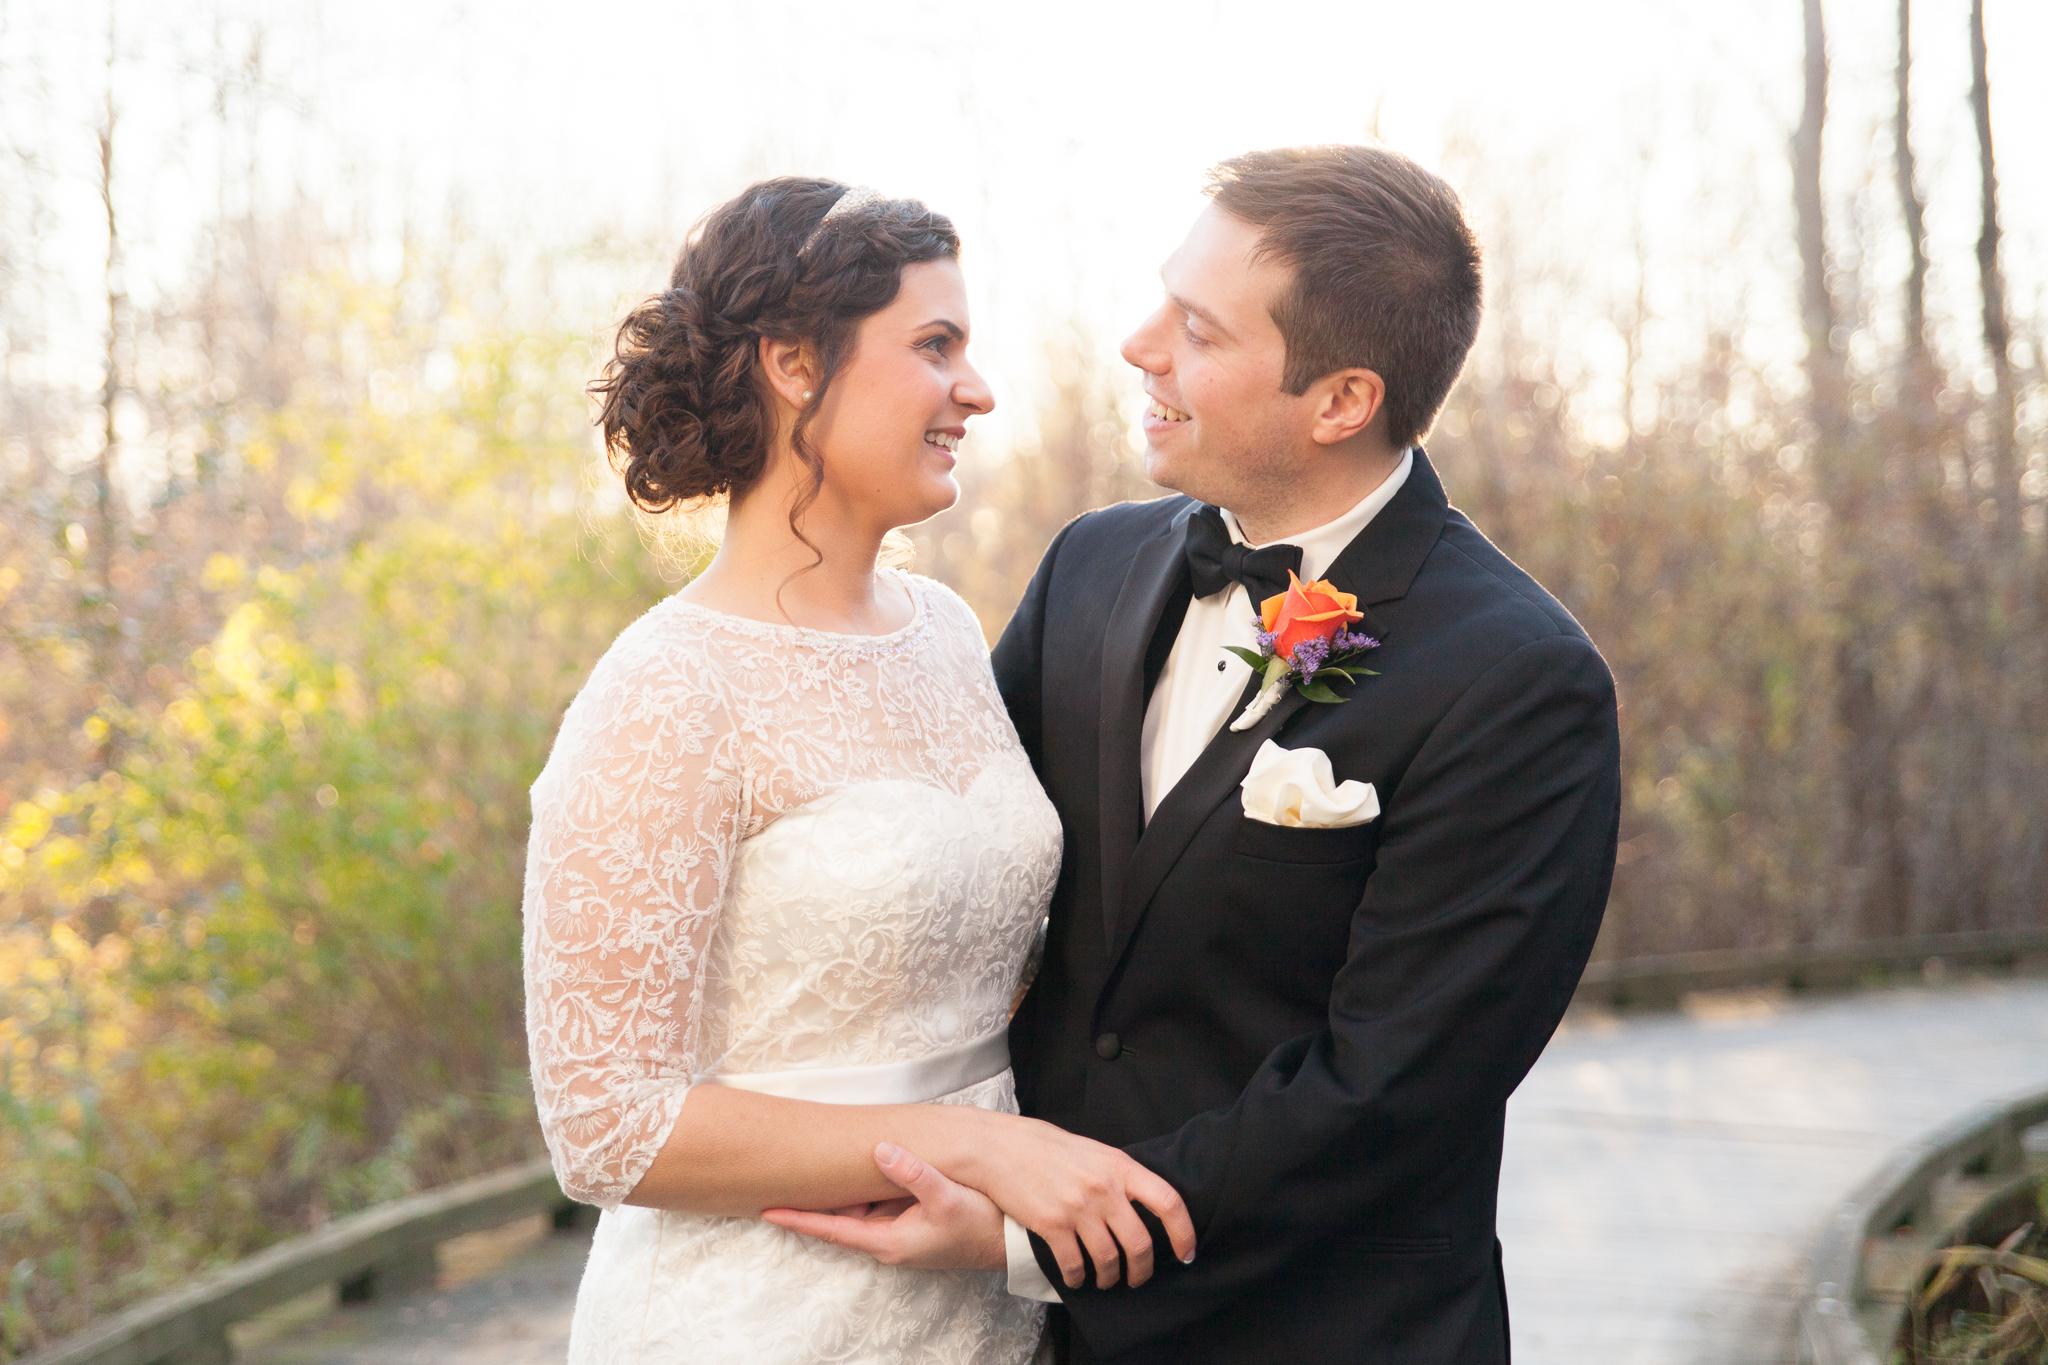 camuglia-whomstudio-chelsea_and_andy-nycphotographer-wedding-brooklyn-buffalo-timberlodge-052-.jpg